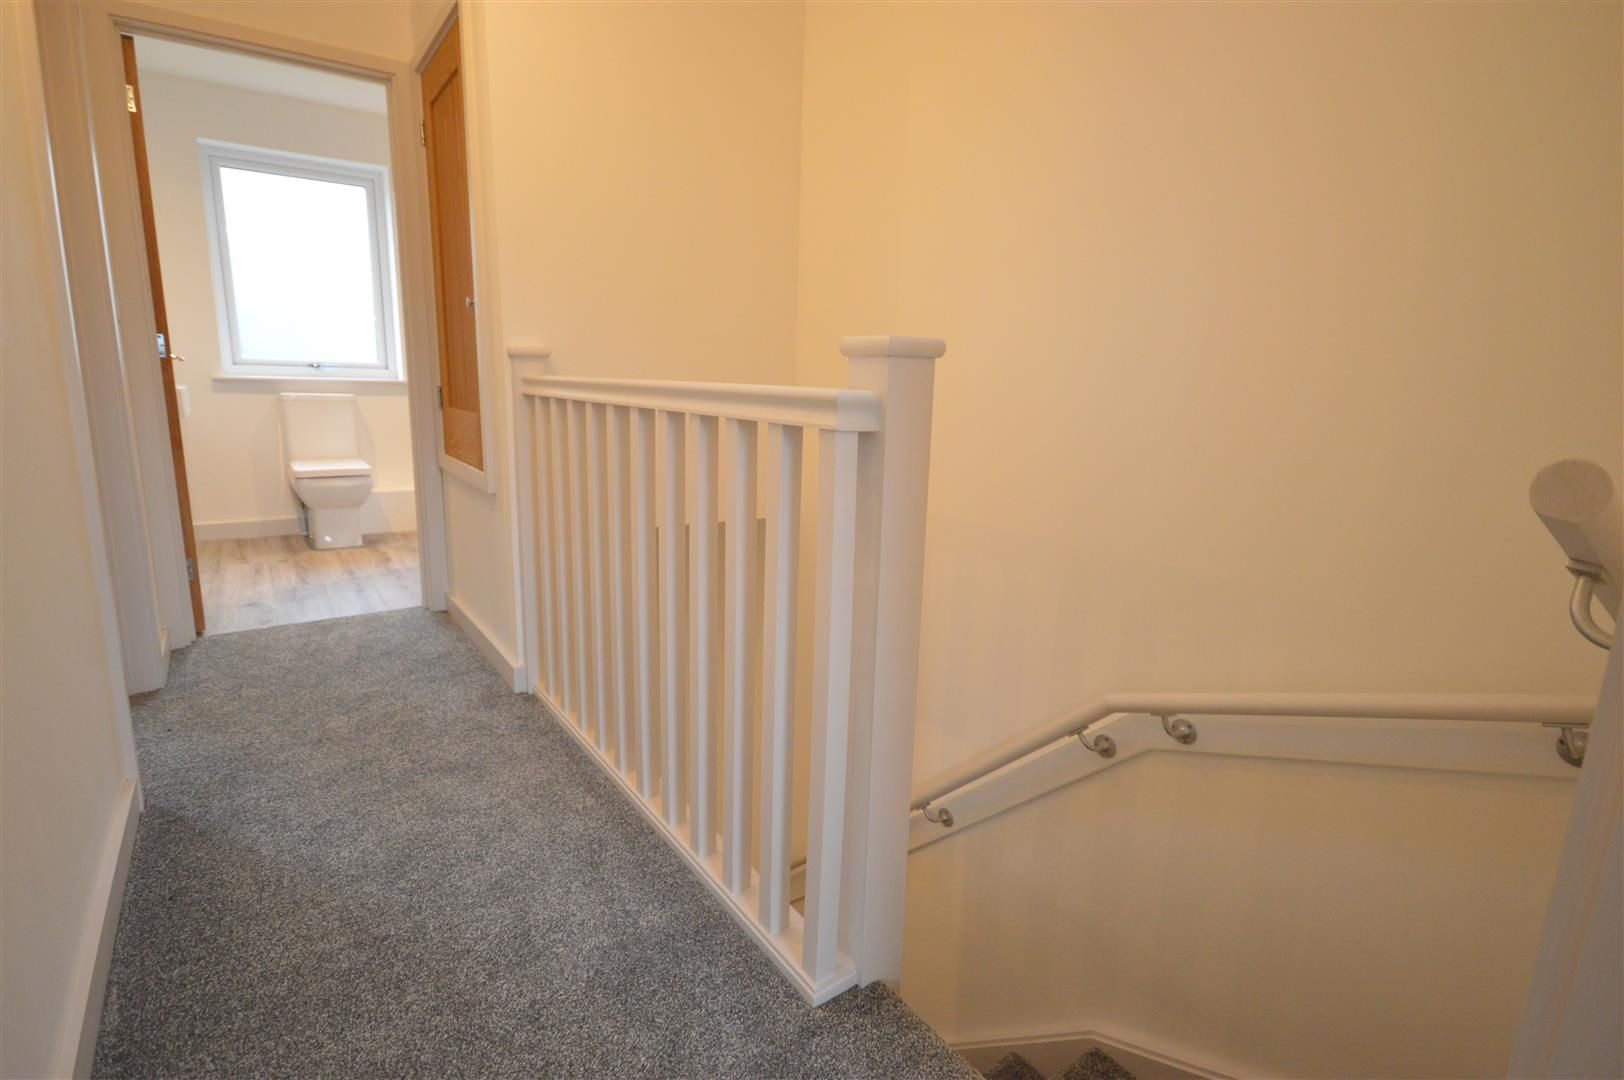 2 bed detached for sale in Leominster 11